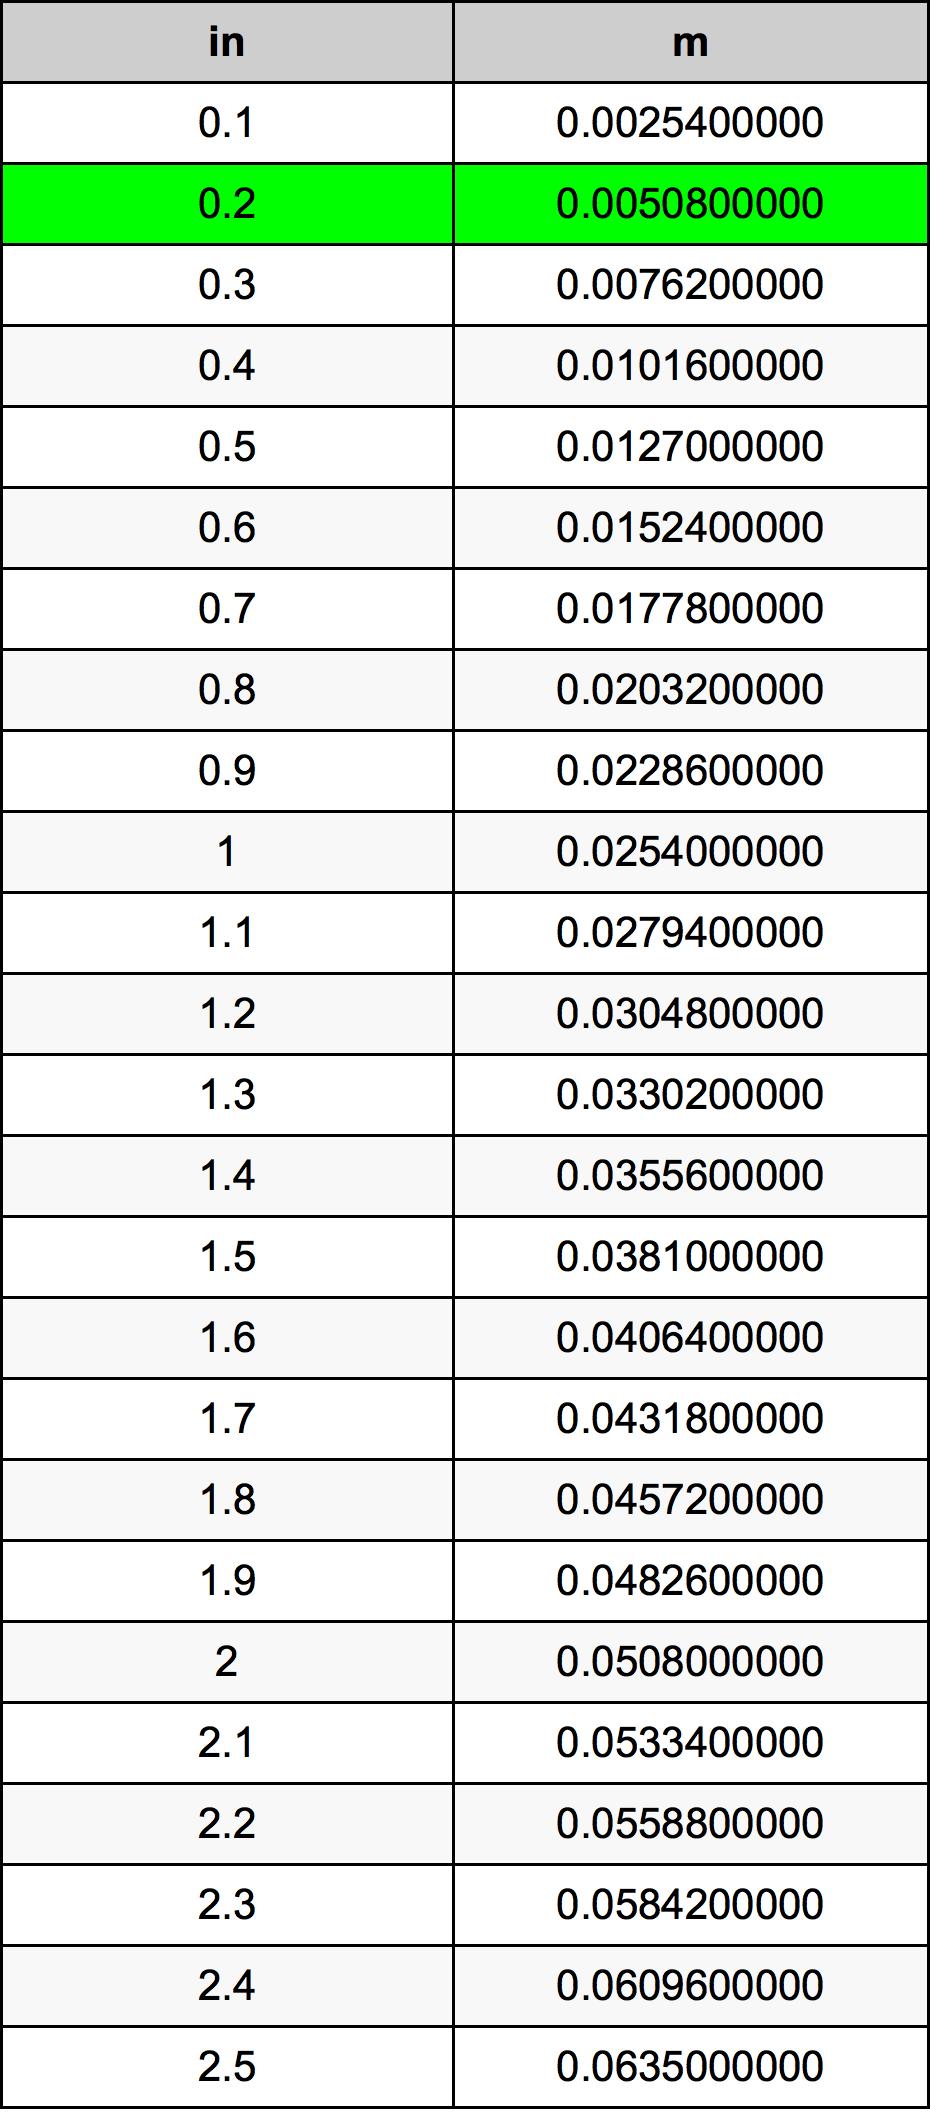 0.2 इंच रूपांतरण सारणी